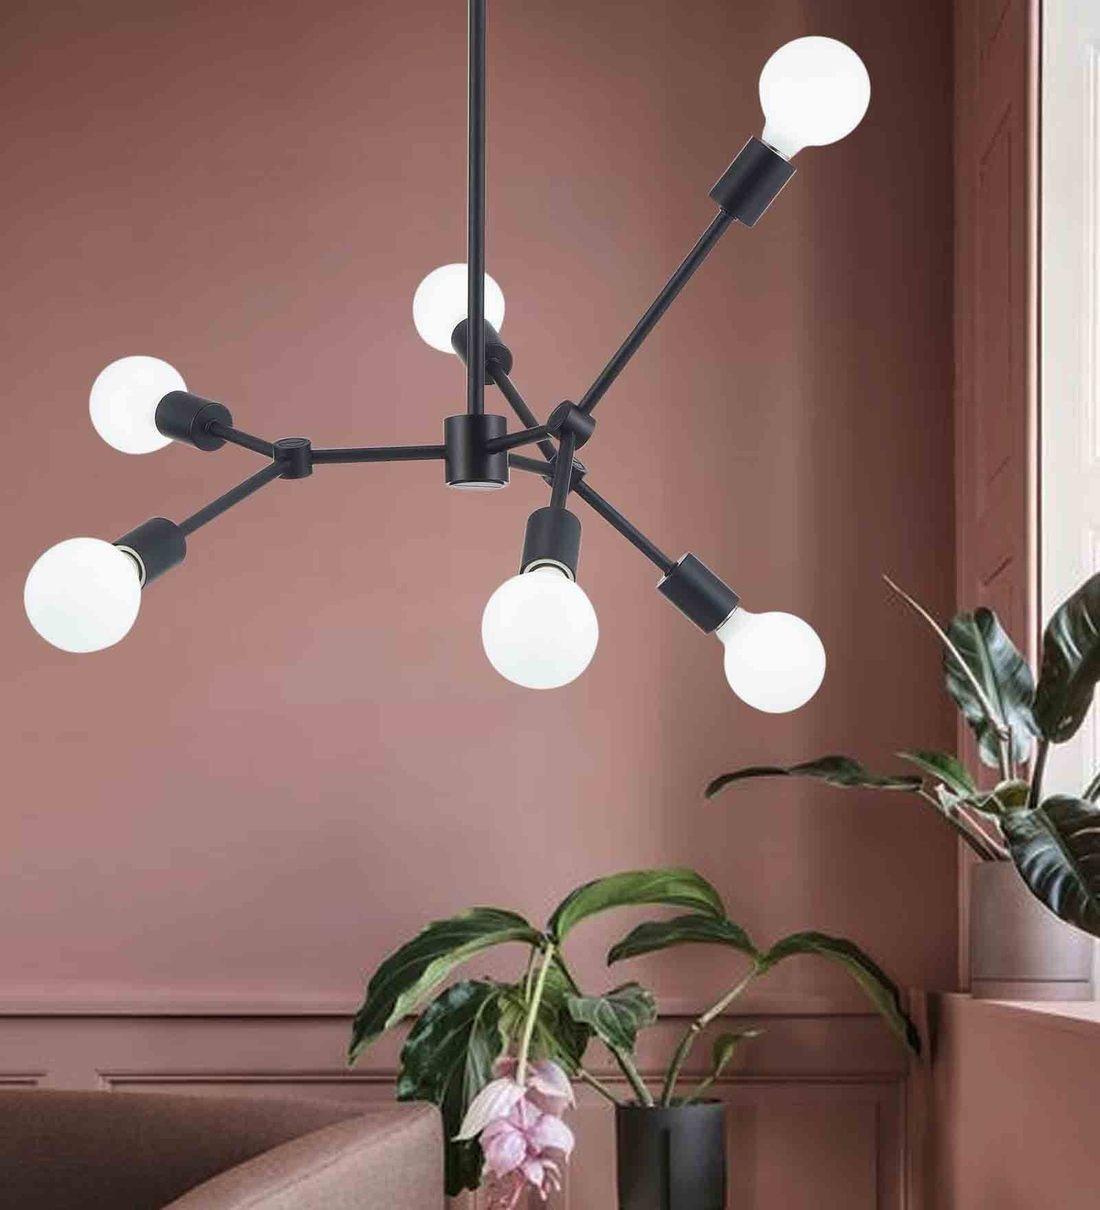 Buy Canopus Black Metal Chandelier By Bohemiana Online Hybrid Chandeliers Ceiling Lights Lamps Lighting Pepperfry Product